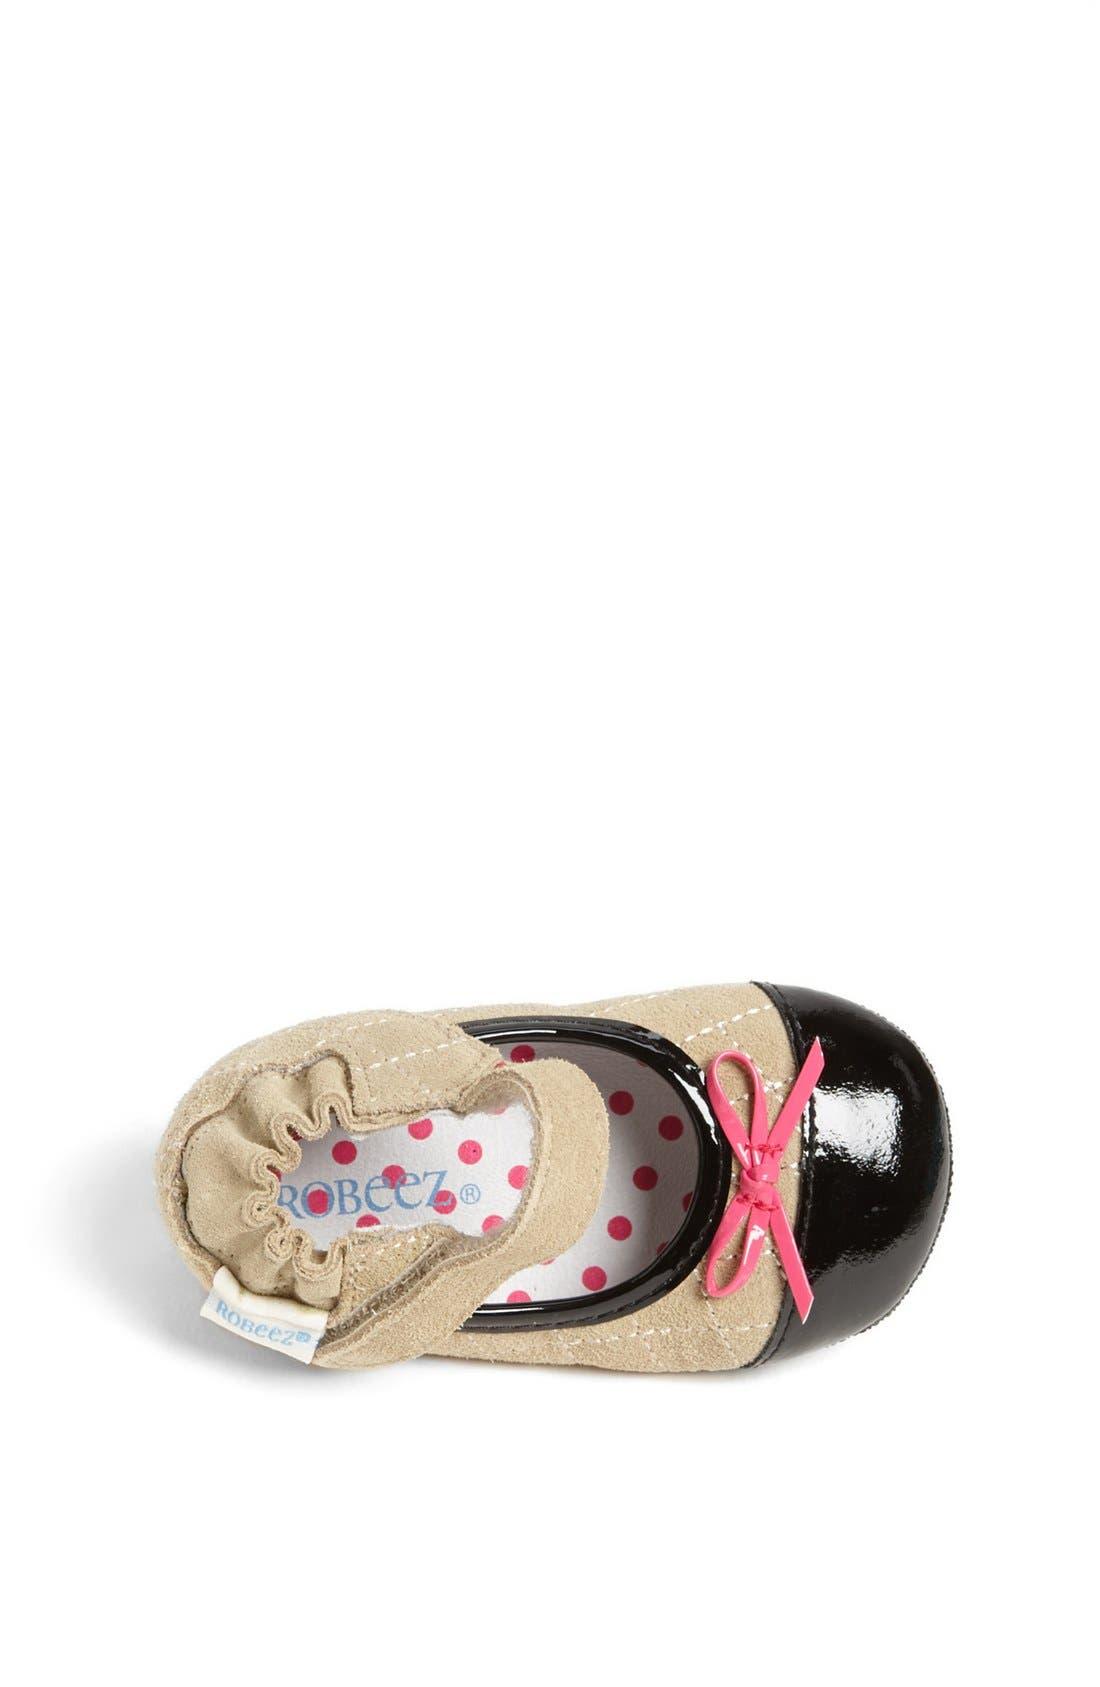 Alternate Image 3  - Robeez® Mini Shoez 'Harper' Mary Jane (Baby & Walker)